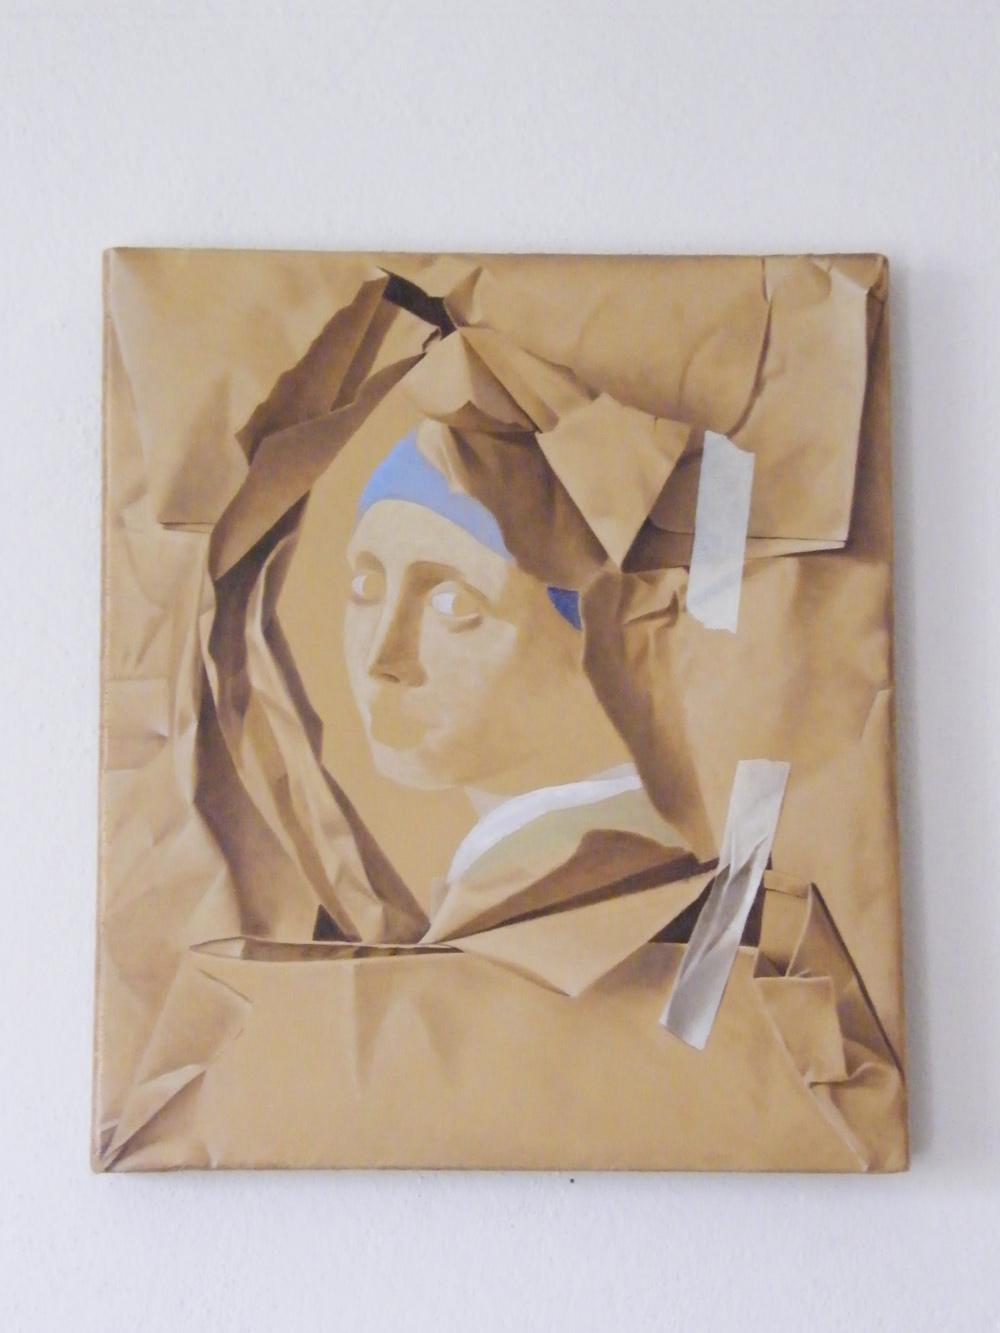 Furto d'artista n°3, 2012, olio su tela cm 39 x 45